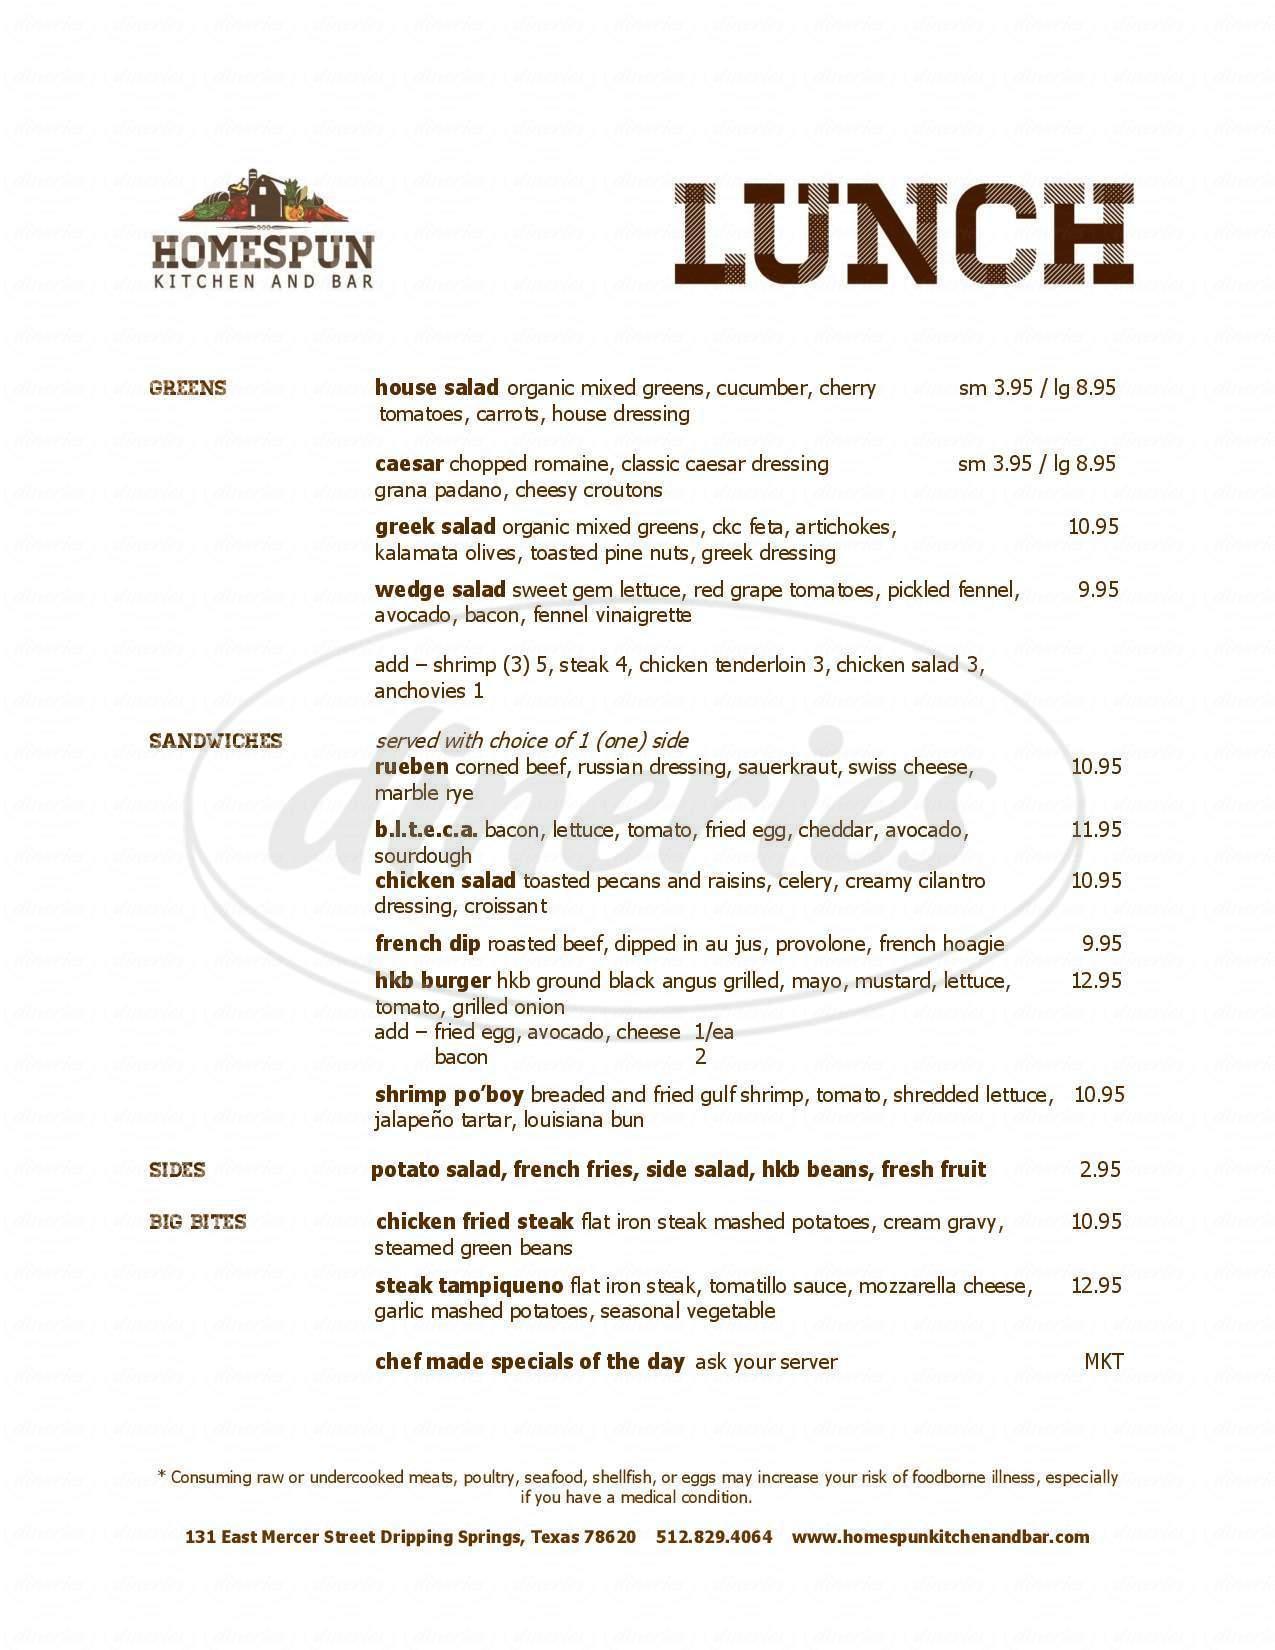 Homespun Kitchen And Bar Menu Dripping Springs Dineries